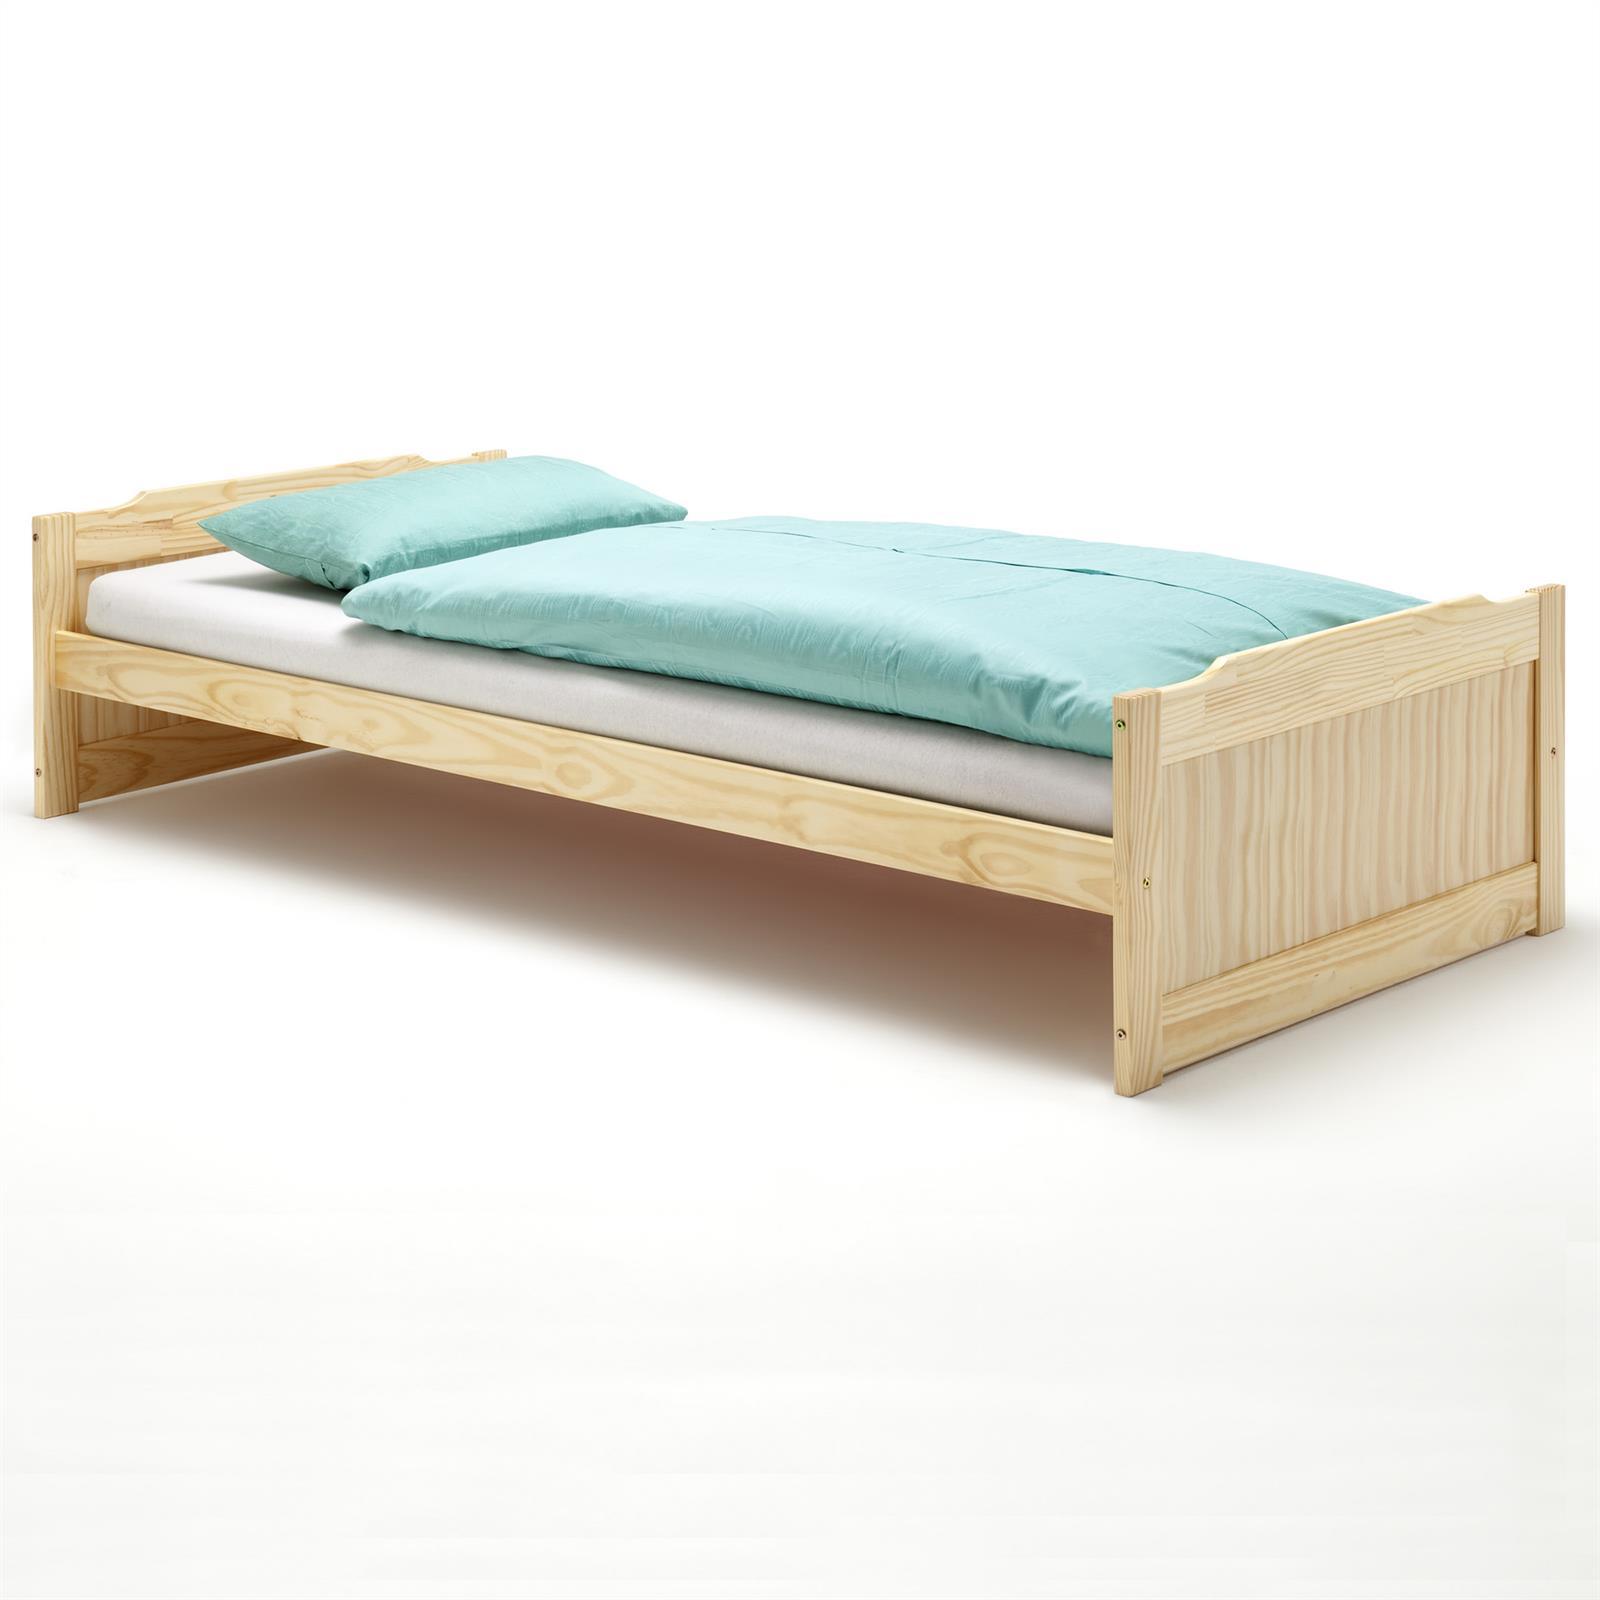 einzelbett fritz 90x200 cm in natur mobilia24. Black Bedroom Furniture Sets. Home Design Ideas